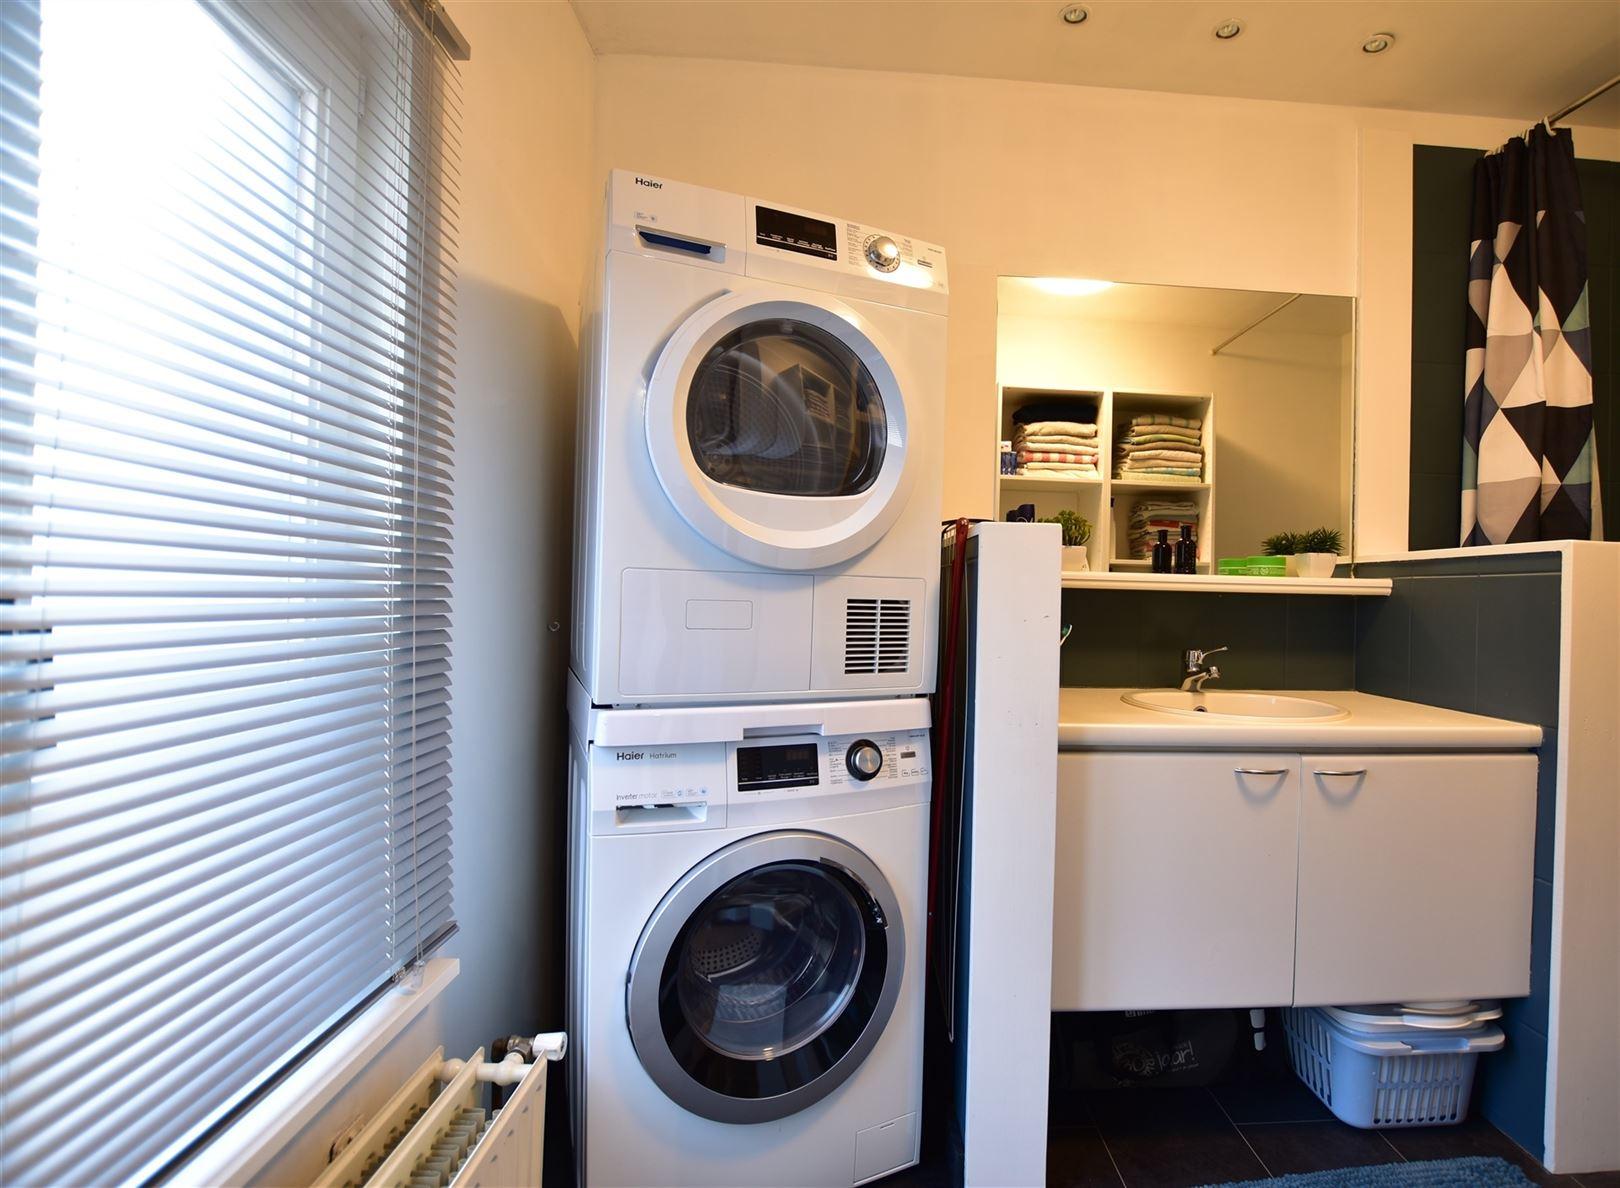 Foto 10 : Duplex/triplex te 9200 BAASRODE (België) - Prijs € 159.000